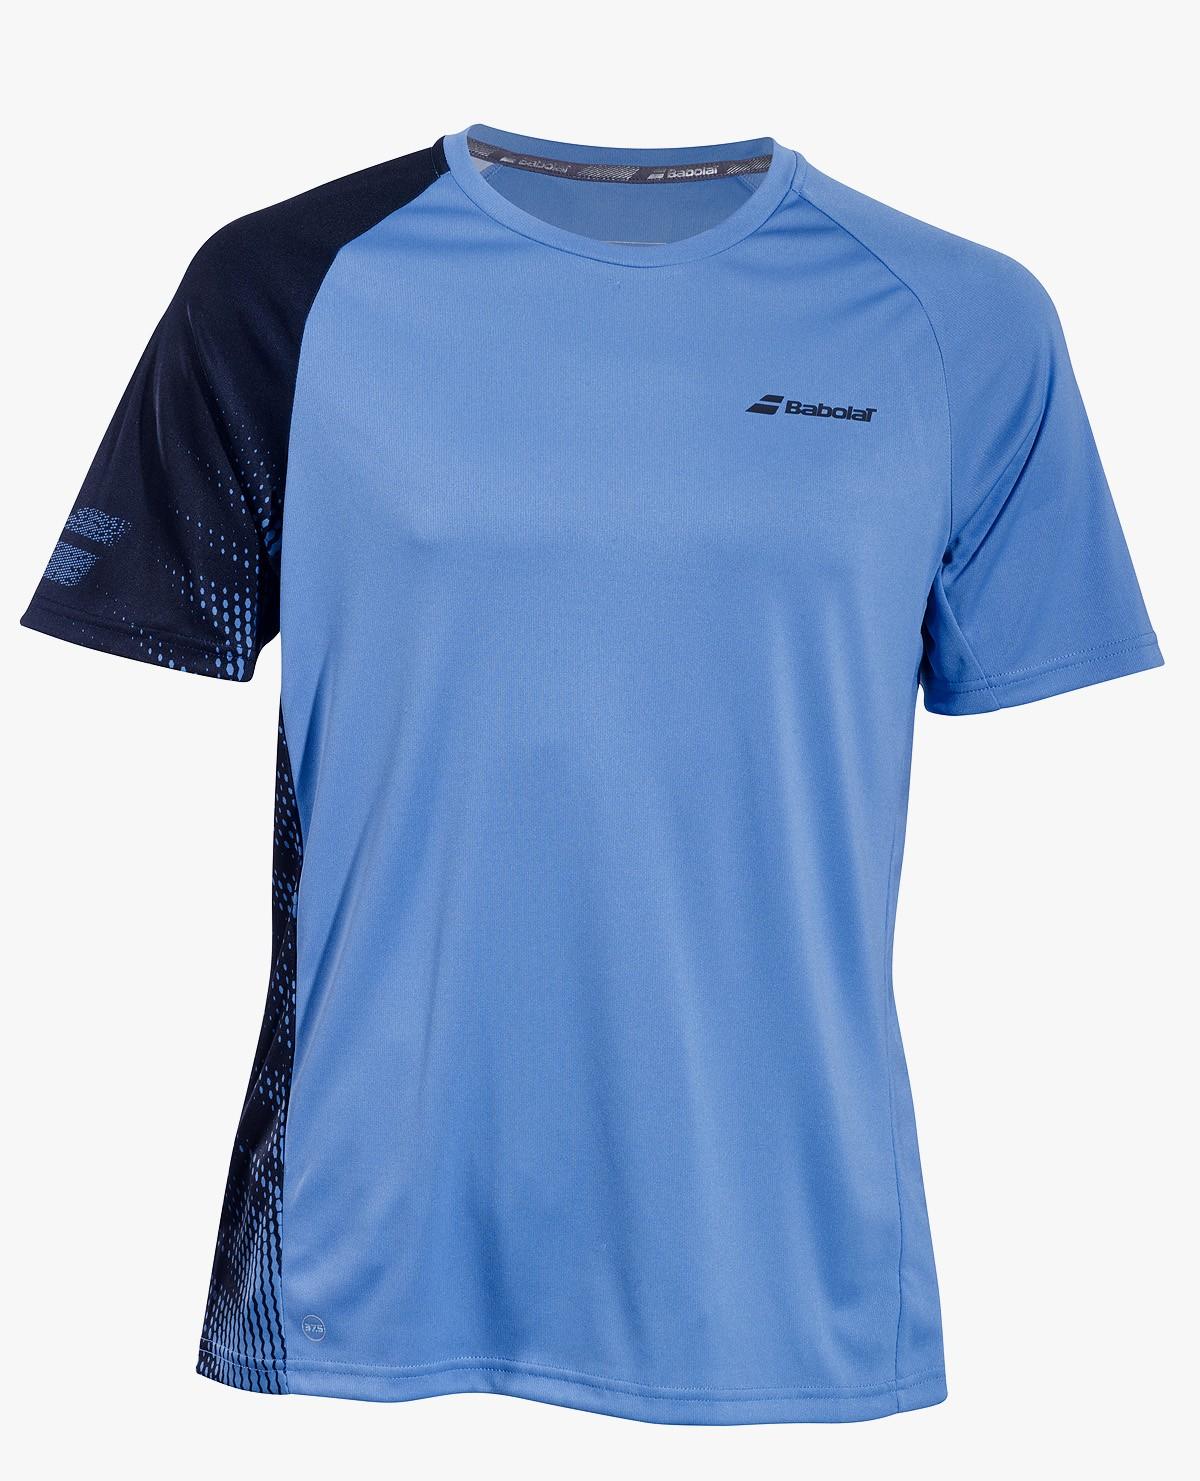 Koszulka tenisowa chłopięca Babolat PERF T-shirt Parisian Blue -45%